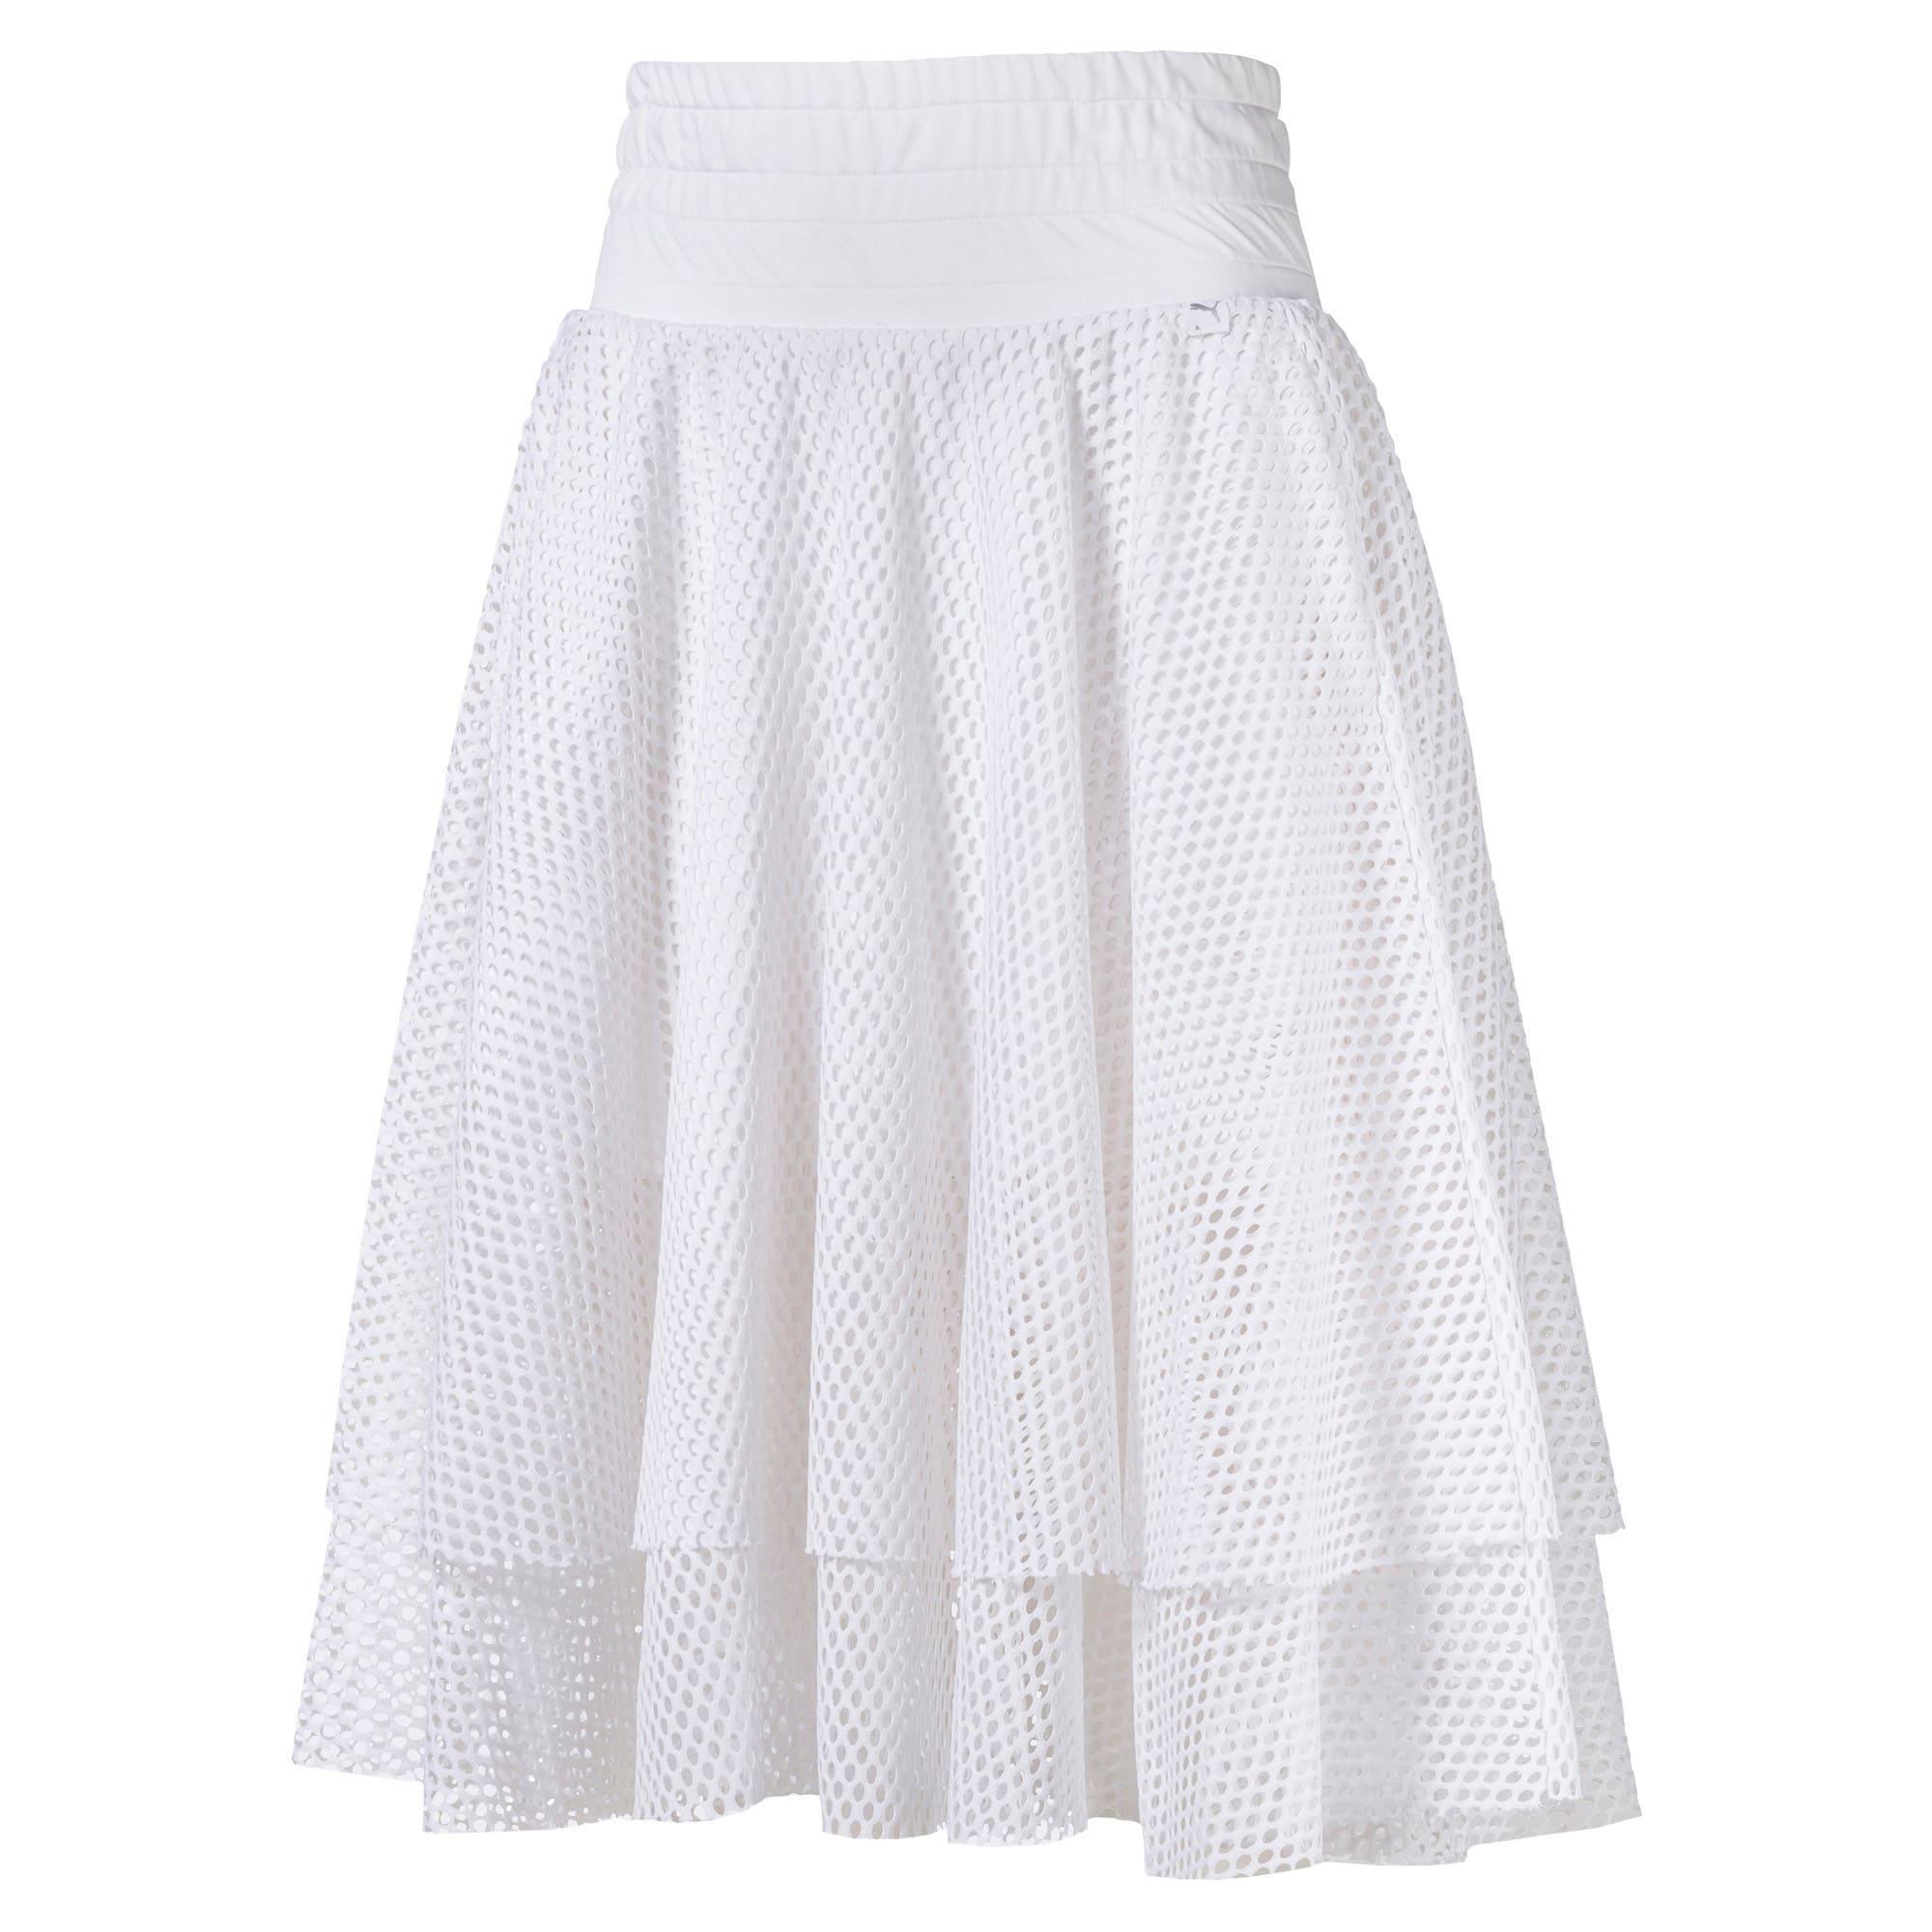 Thumbnail 4 of En Pointe Women's Skirt, Puma White, medium-IND